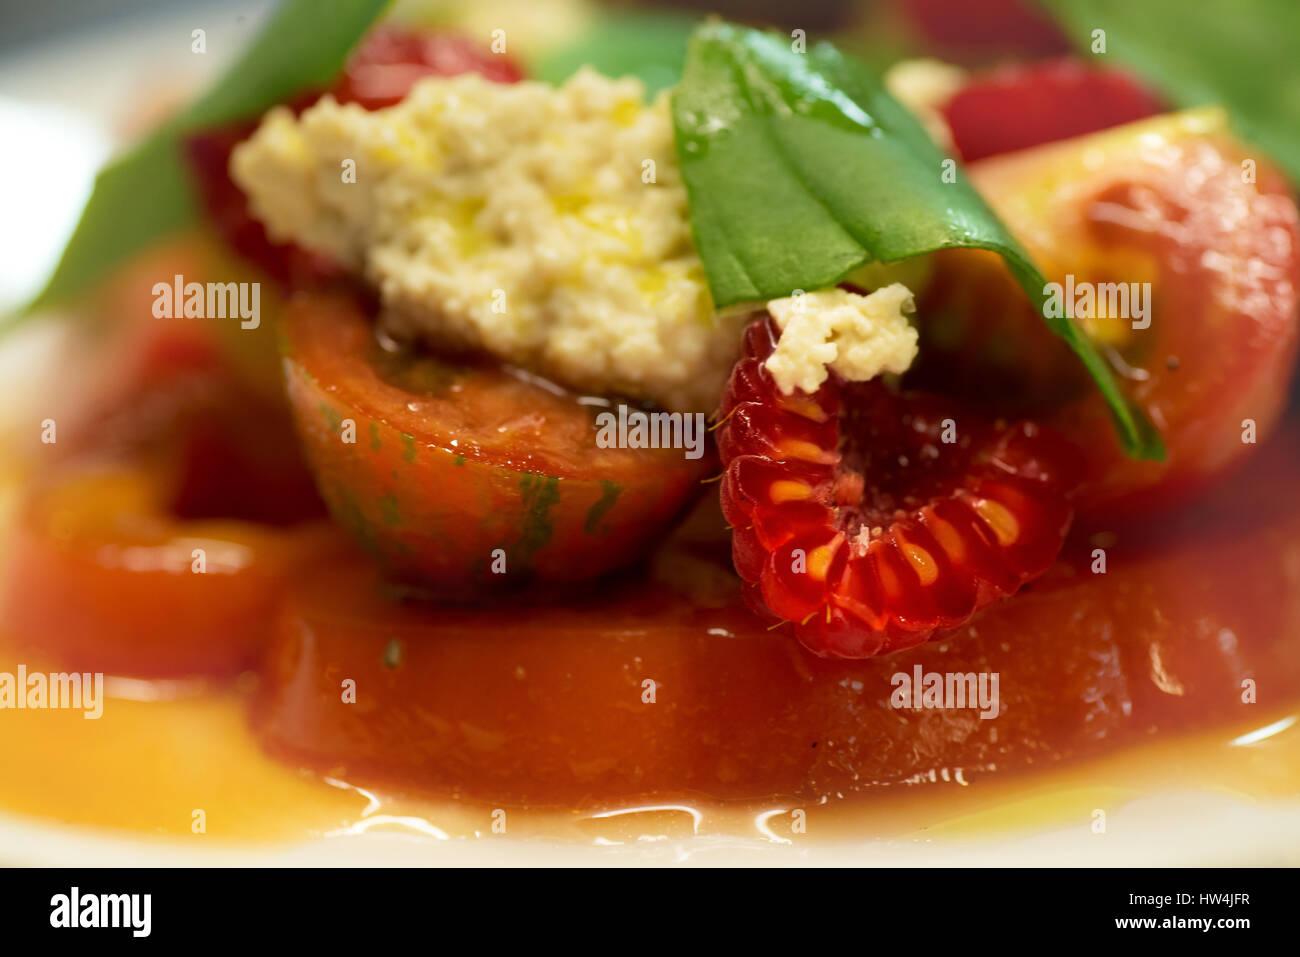 Raspberry, tomato and feta salad - Stock Image